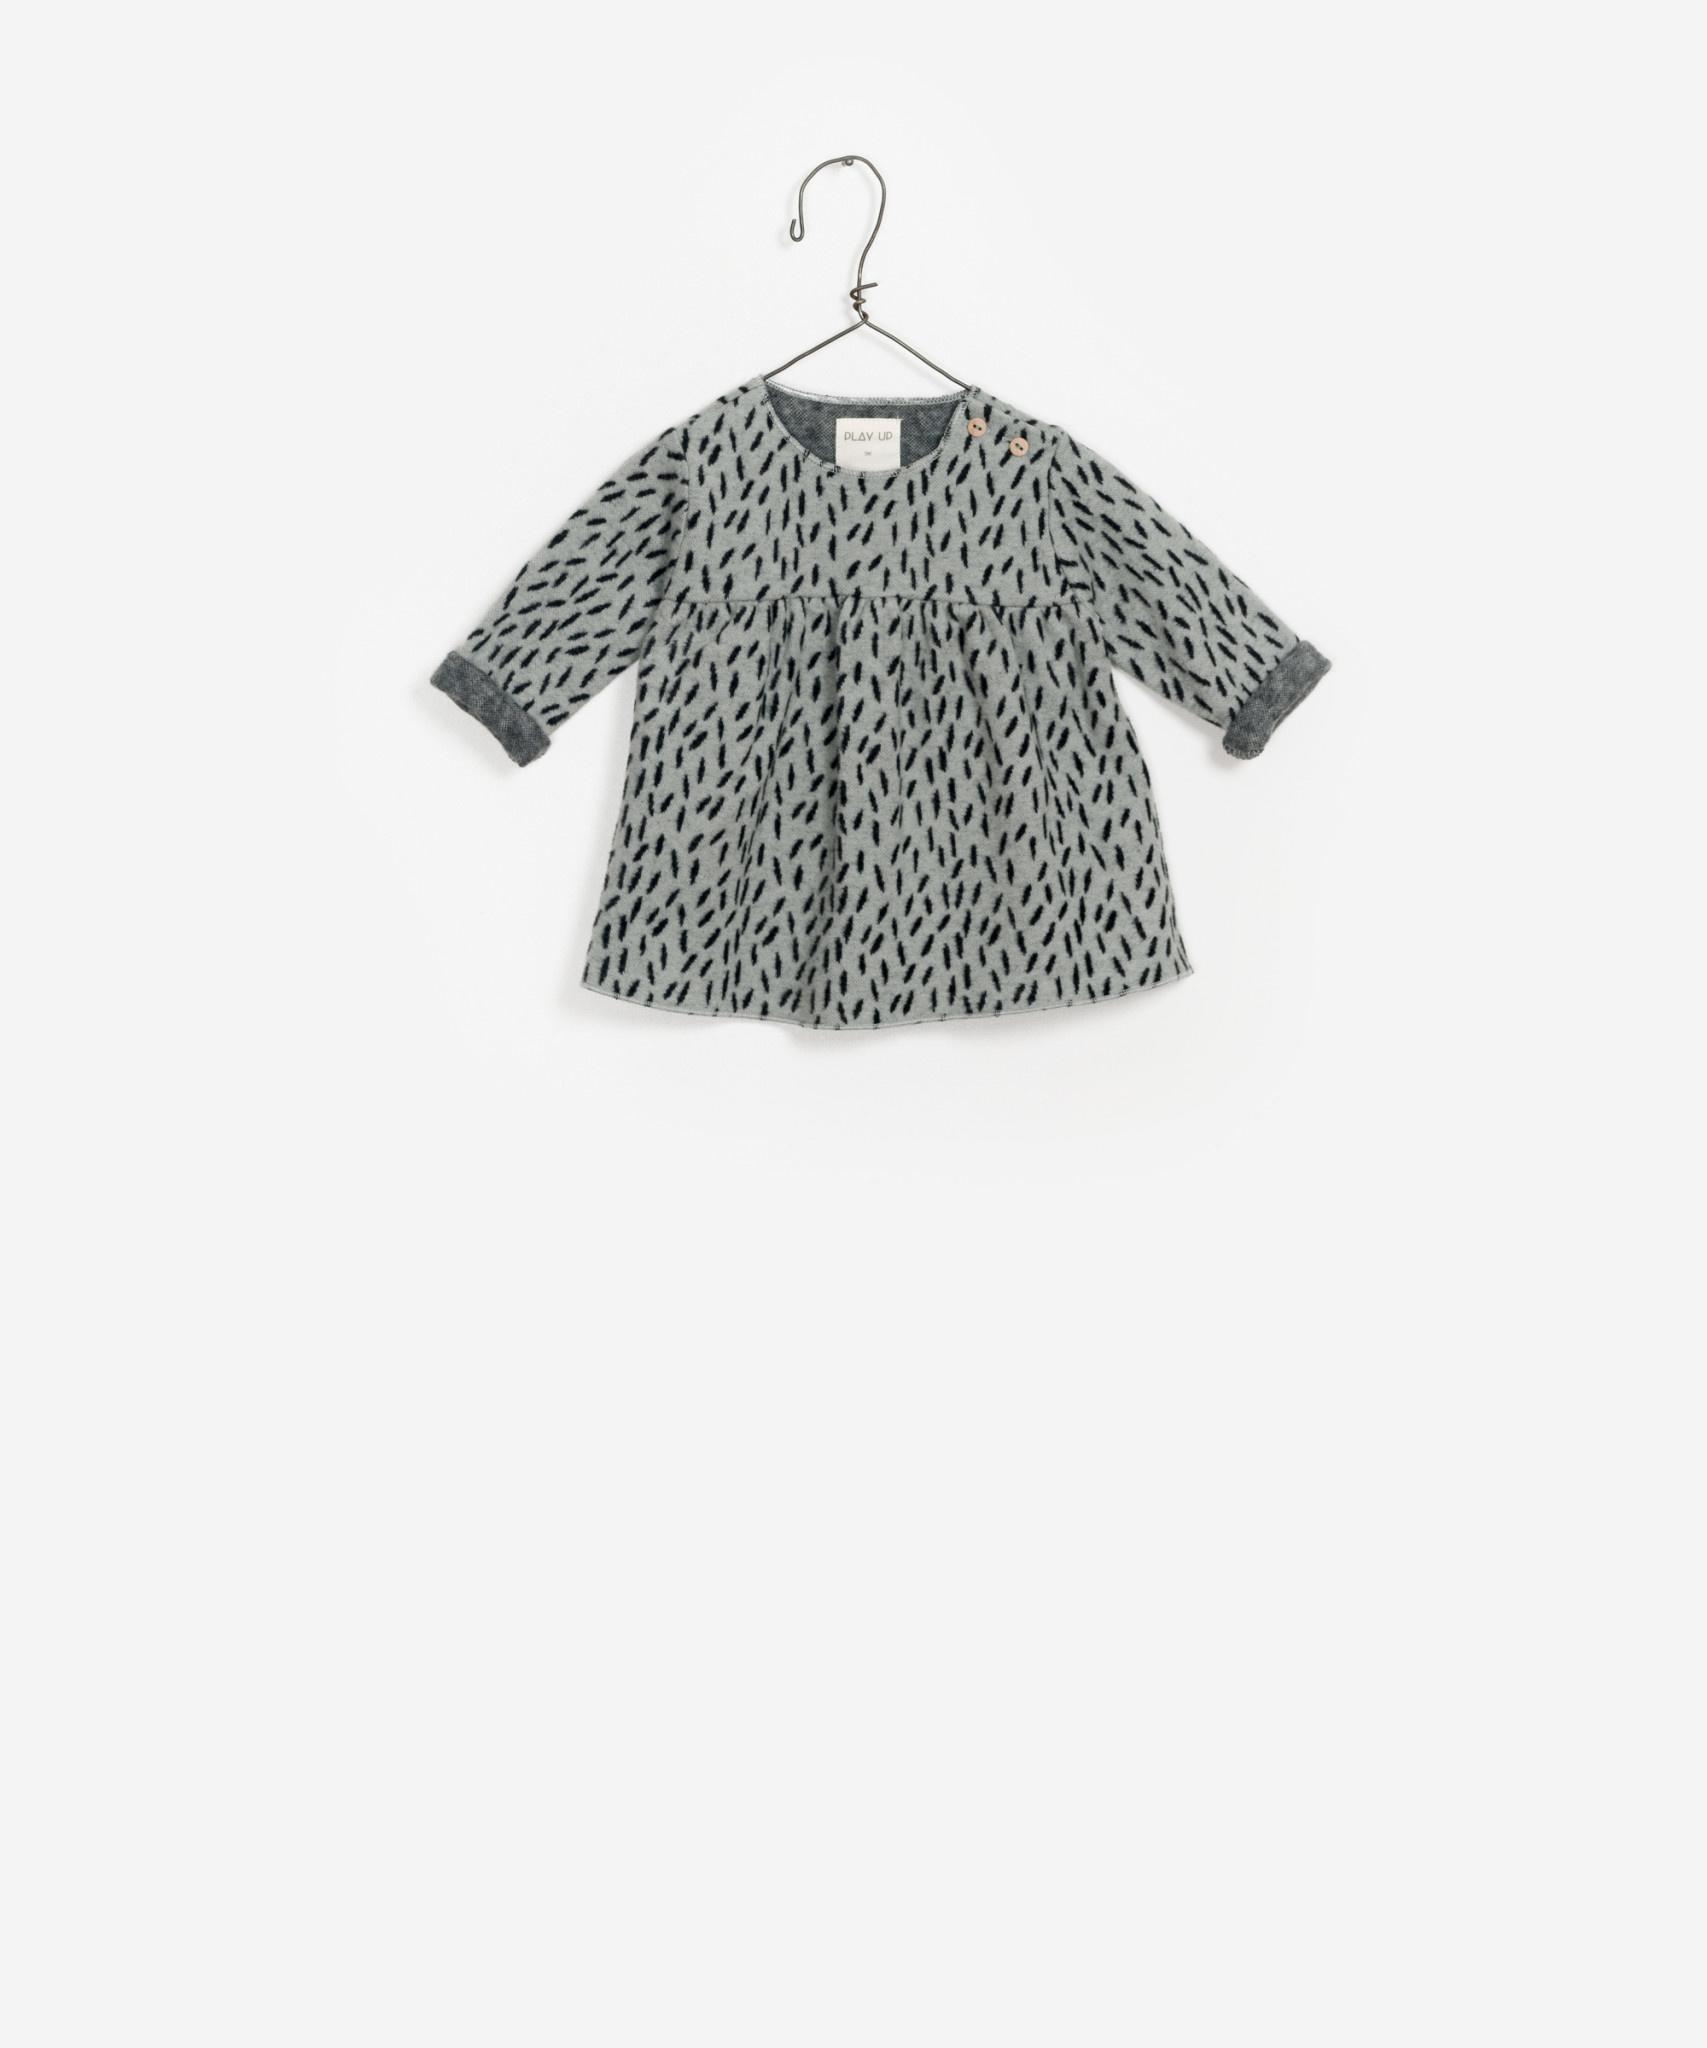 Play Up Jacquard Sweater 2AF11205